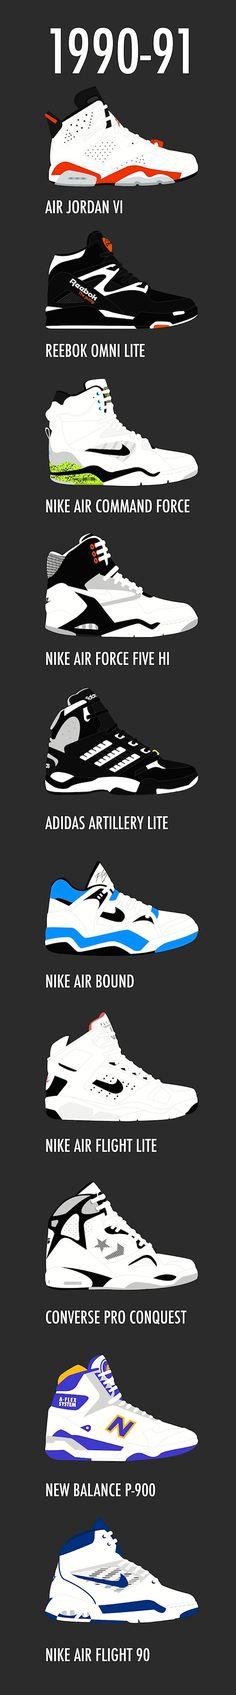 online retailer 44e28 c749d TOP Sneakesrs de los 90s Nike Free Runners, Schuhe Turnschuhe, Retro  Turnschuhe, Sneaker